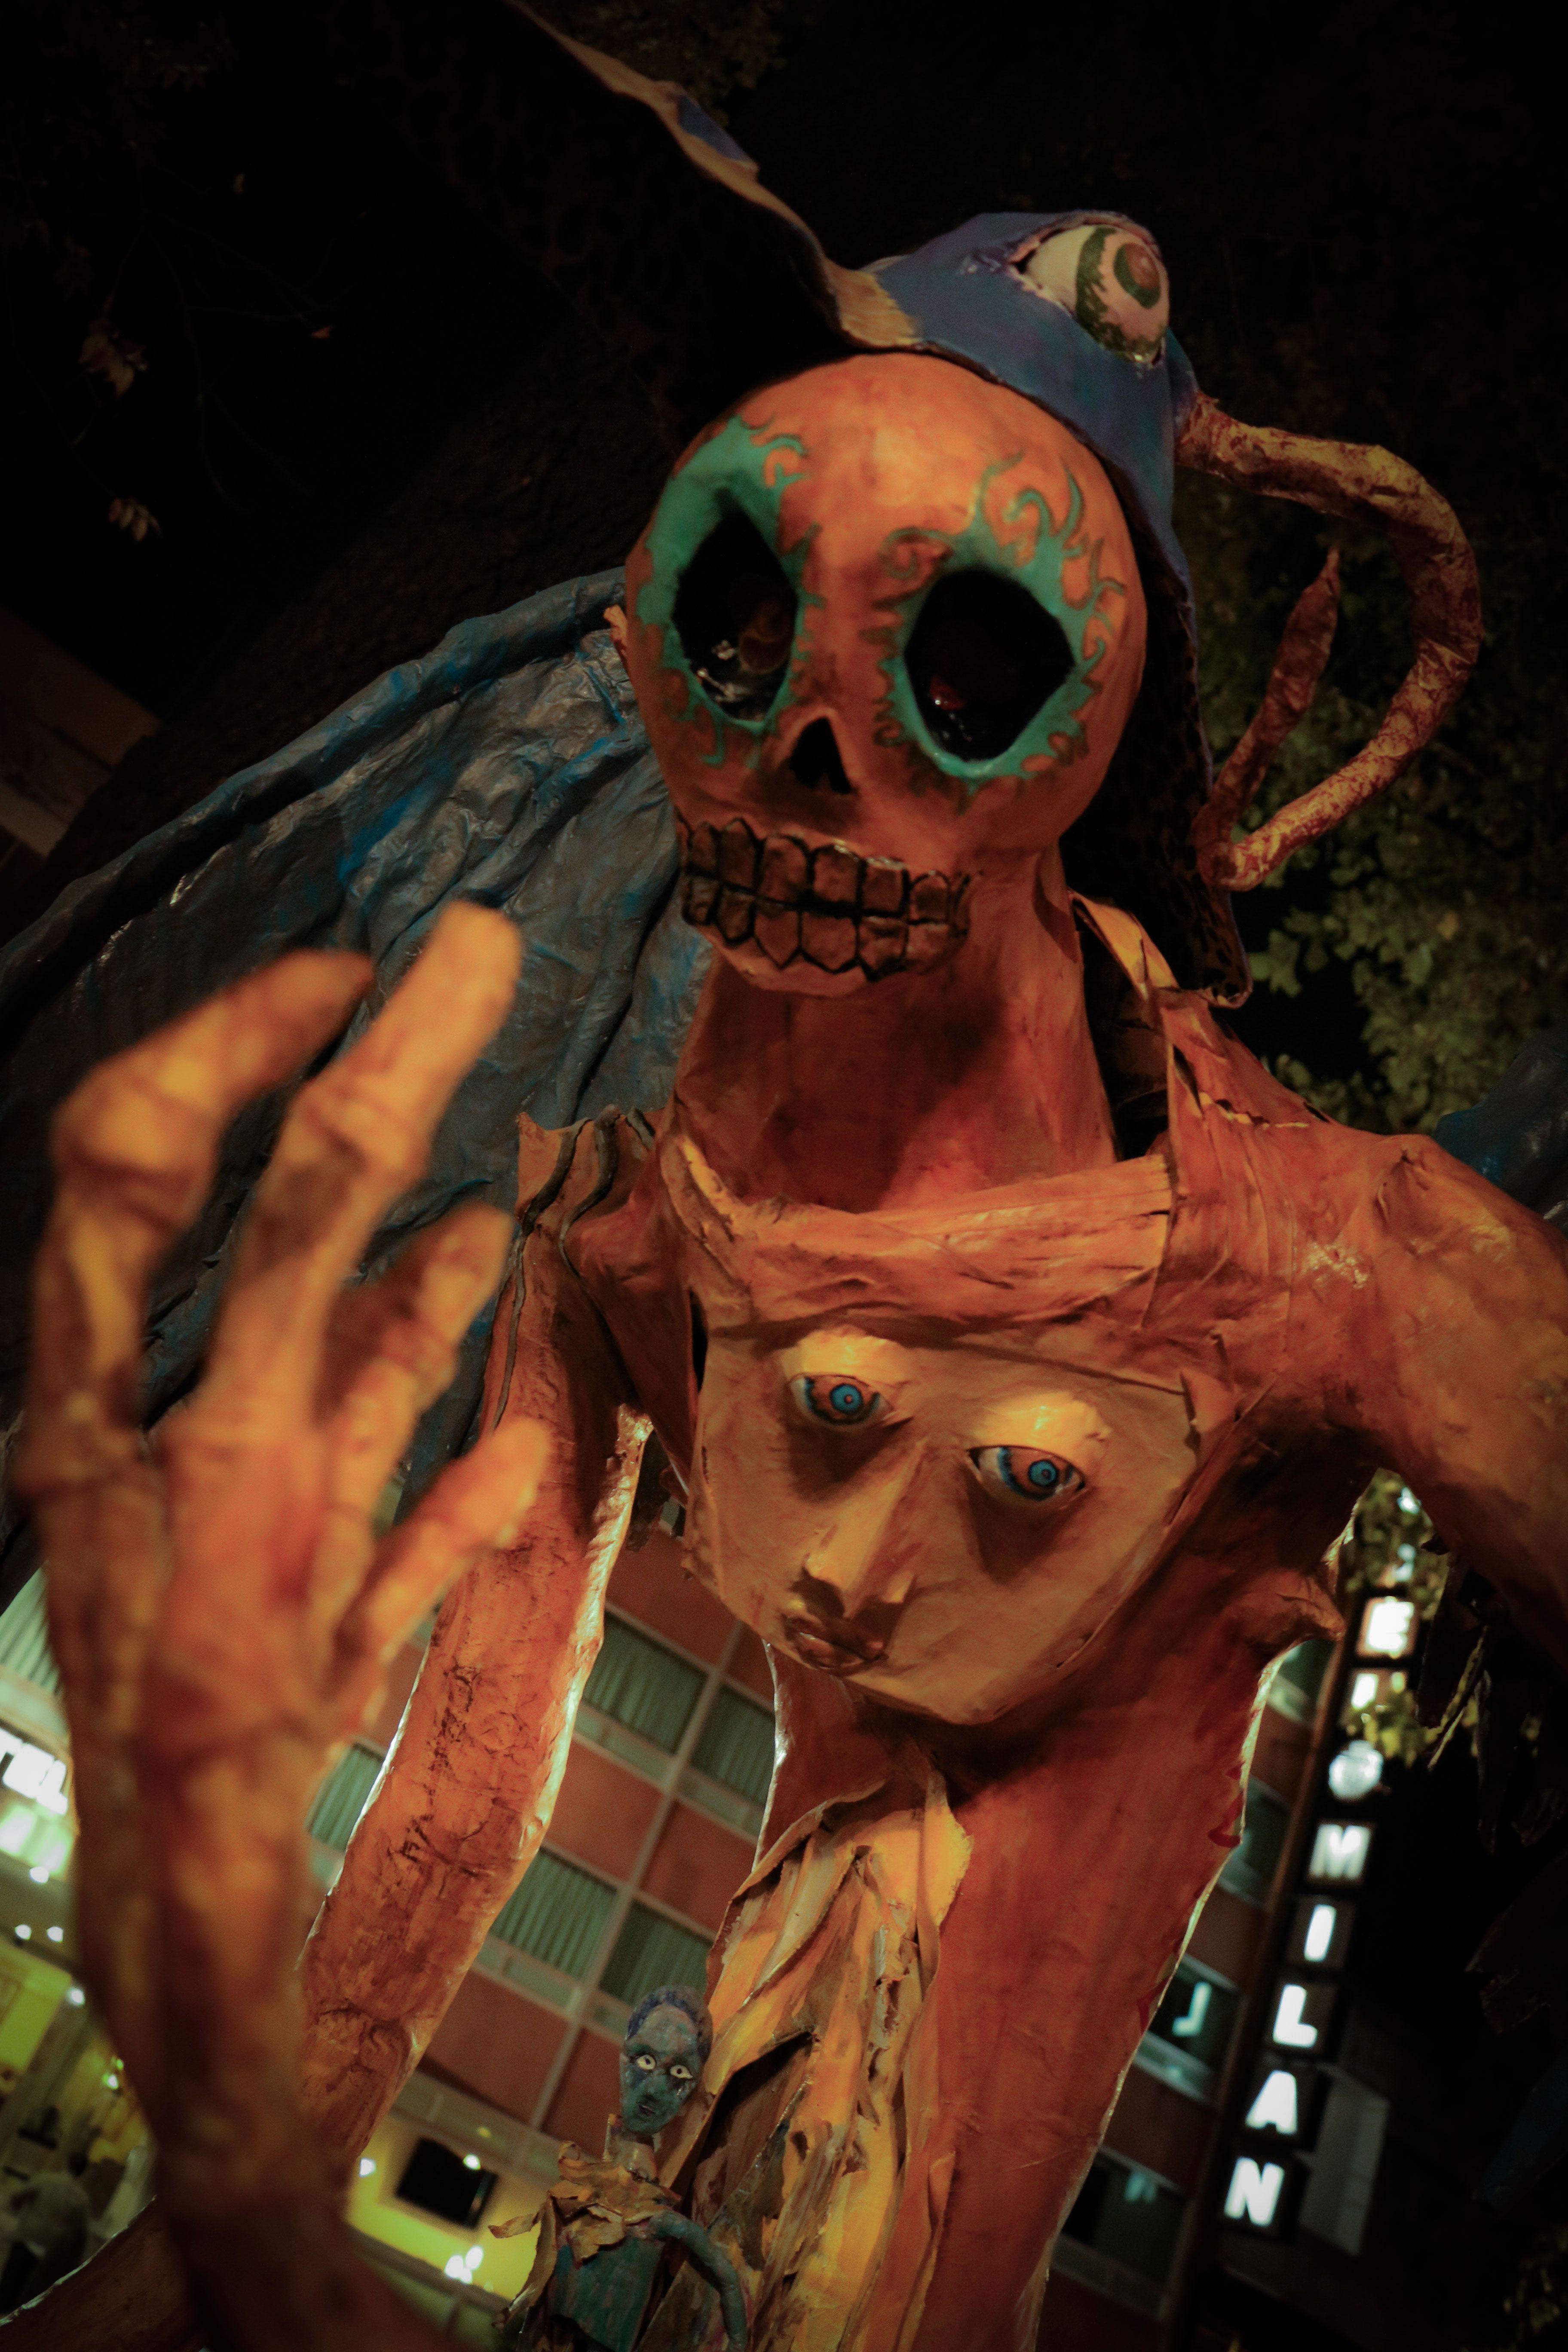 #alebrijes #mexico #diademuertos #calaveras #scull #sculls #mexicanart #mexican #latin #mexicocity #alebrijesreforma #folkart #adrianadreves #dreves #monster #dragon #nightmare #remediosvaro